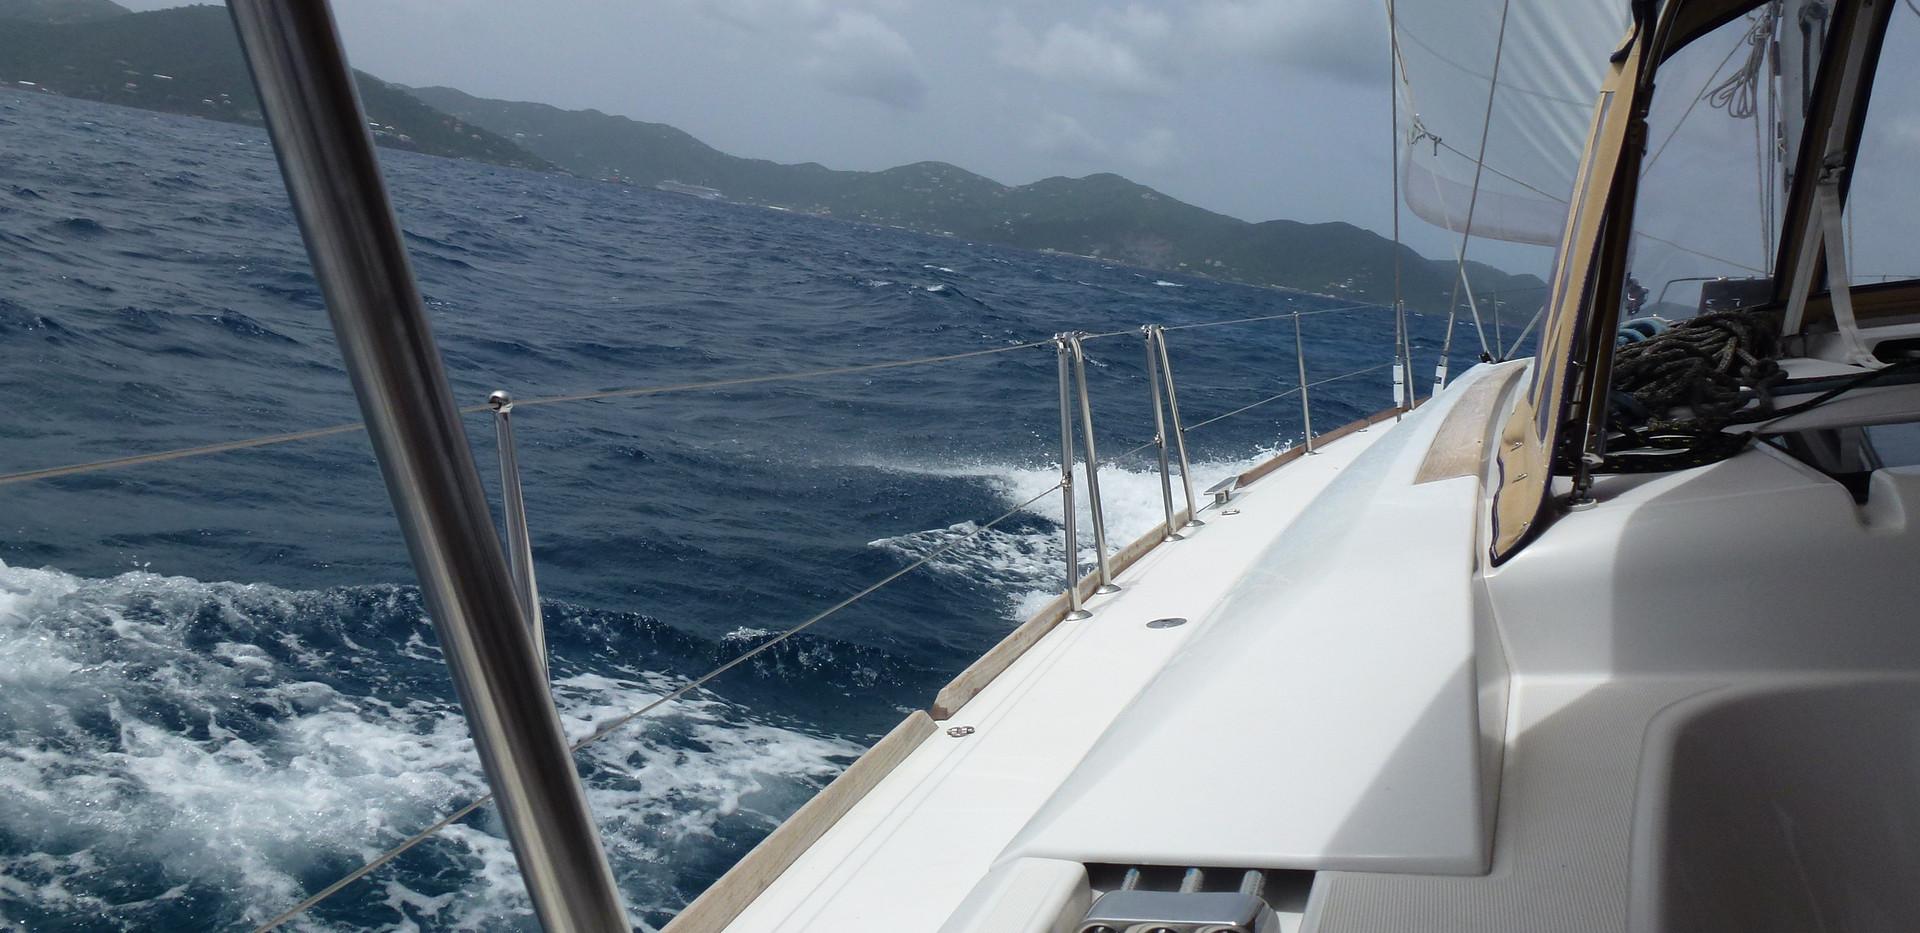 French-Maid-Sailing-Helm-View.JPG